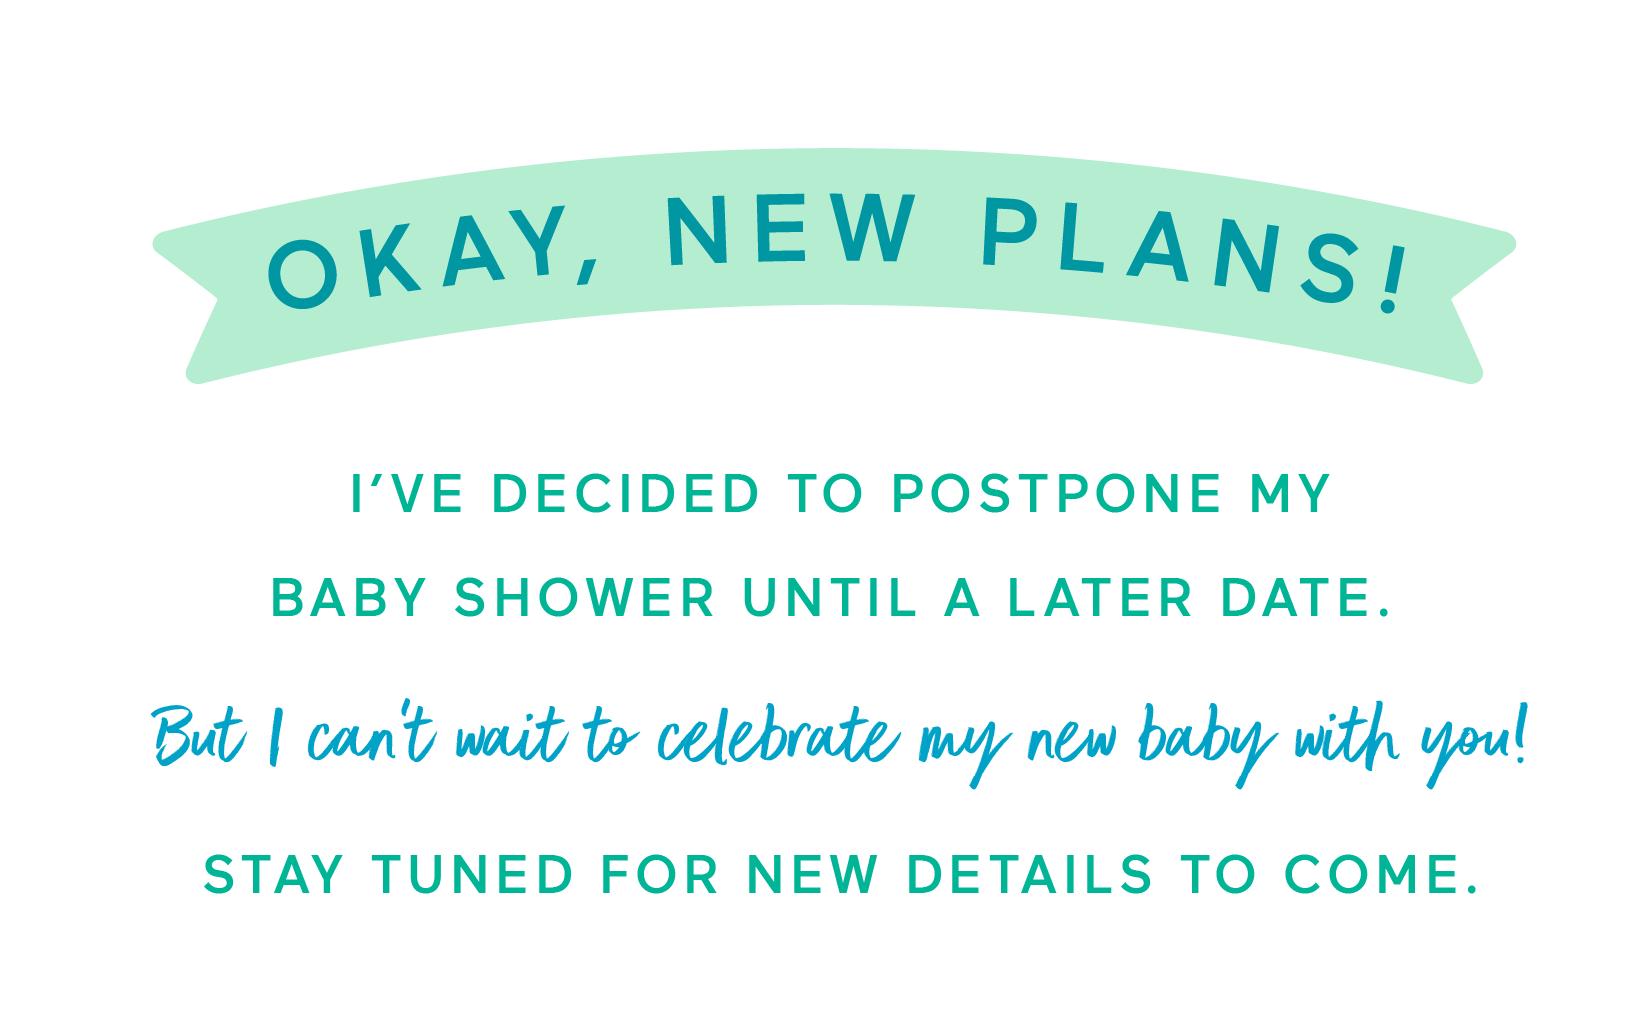 Baby Shower Postponement Cards from Babylist